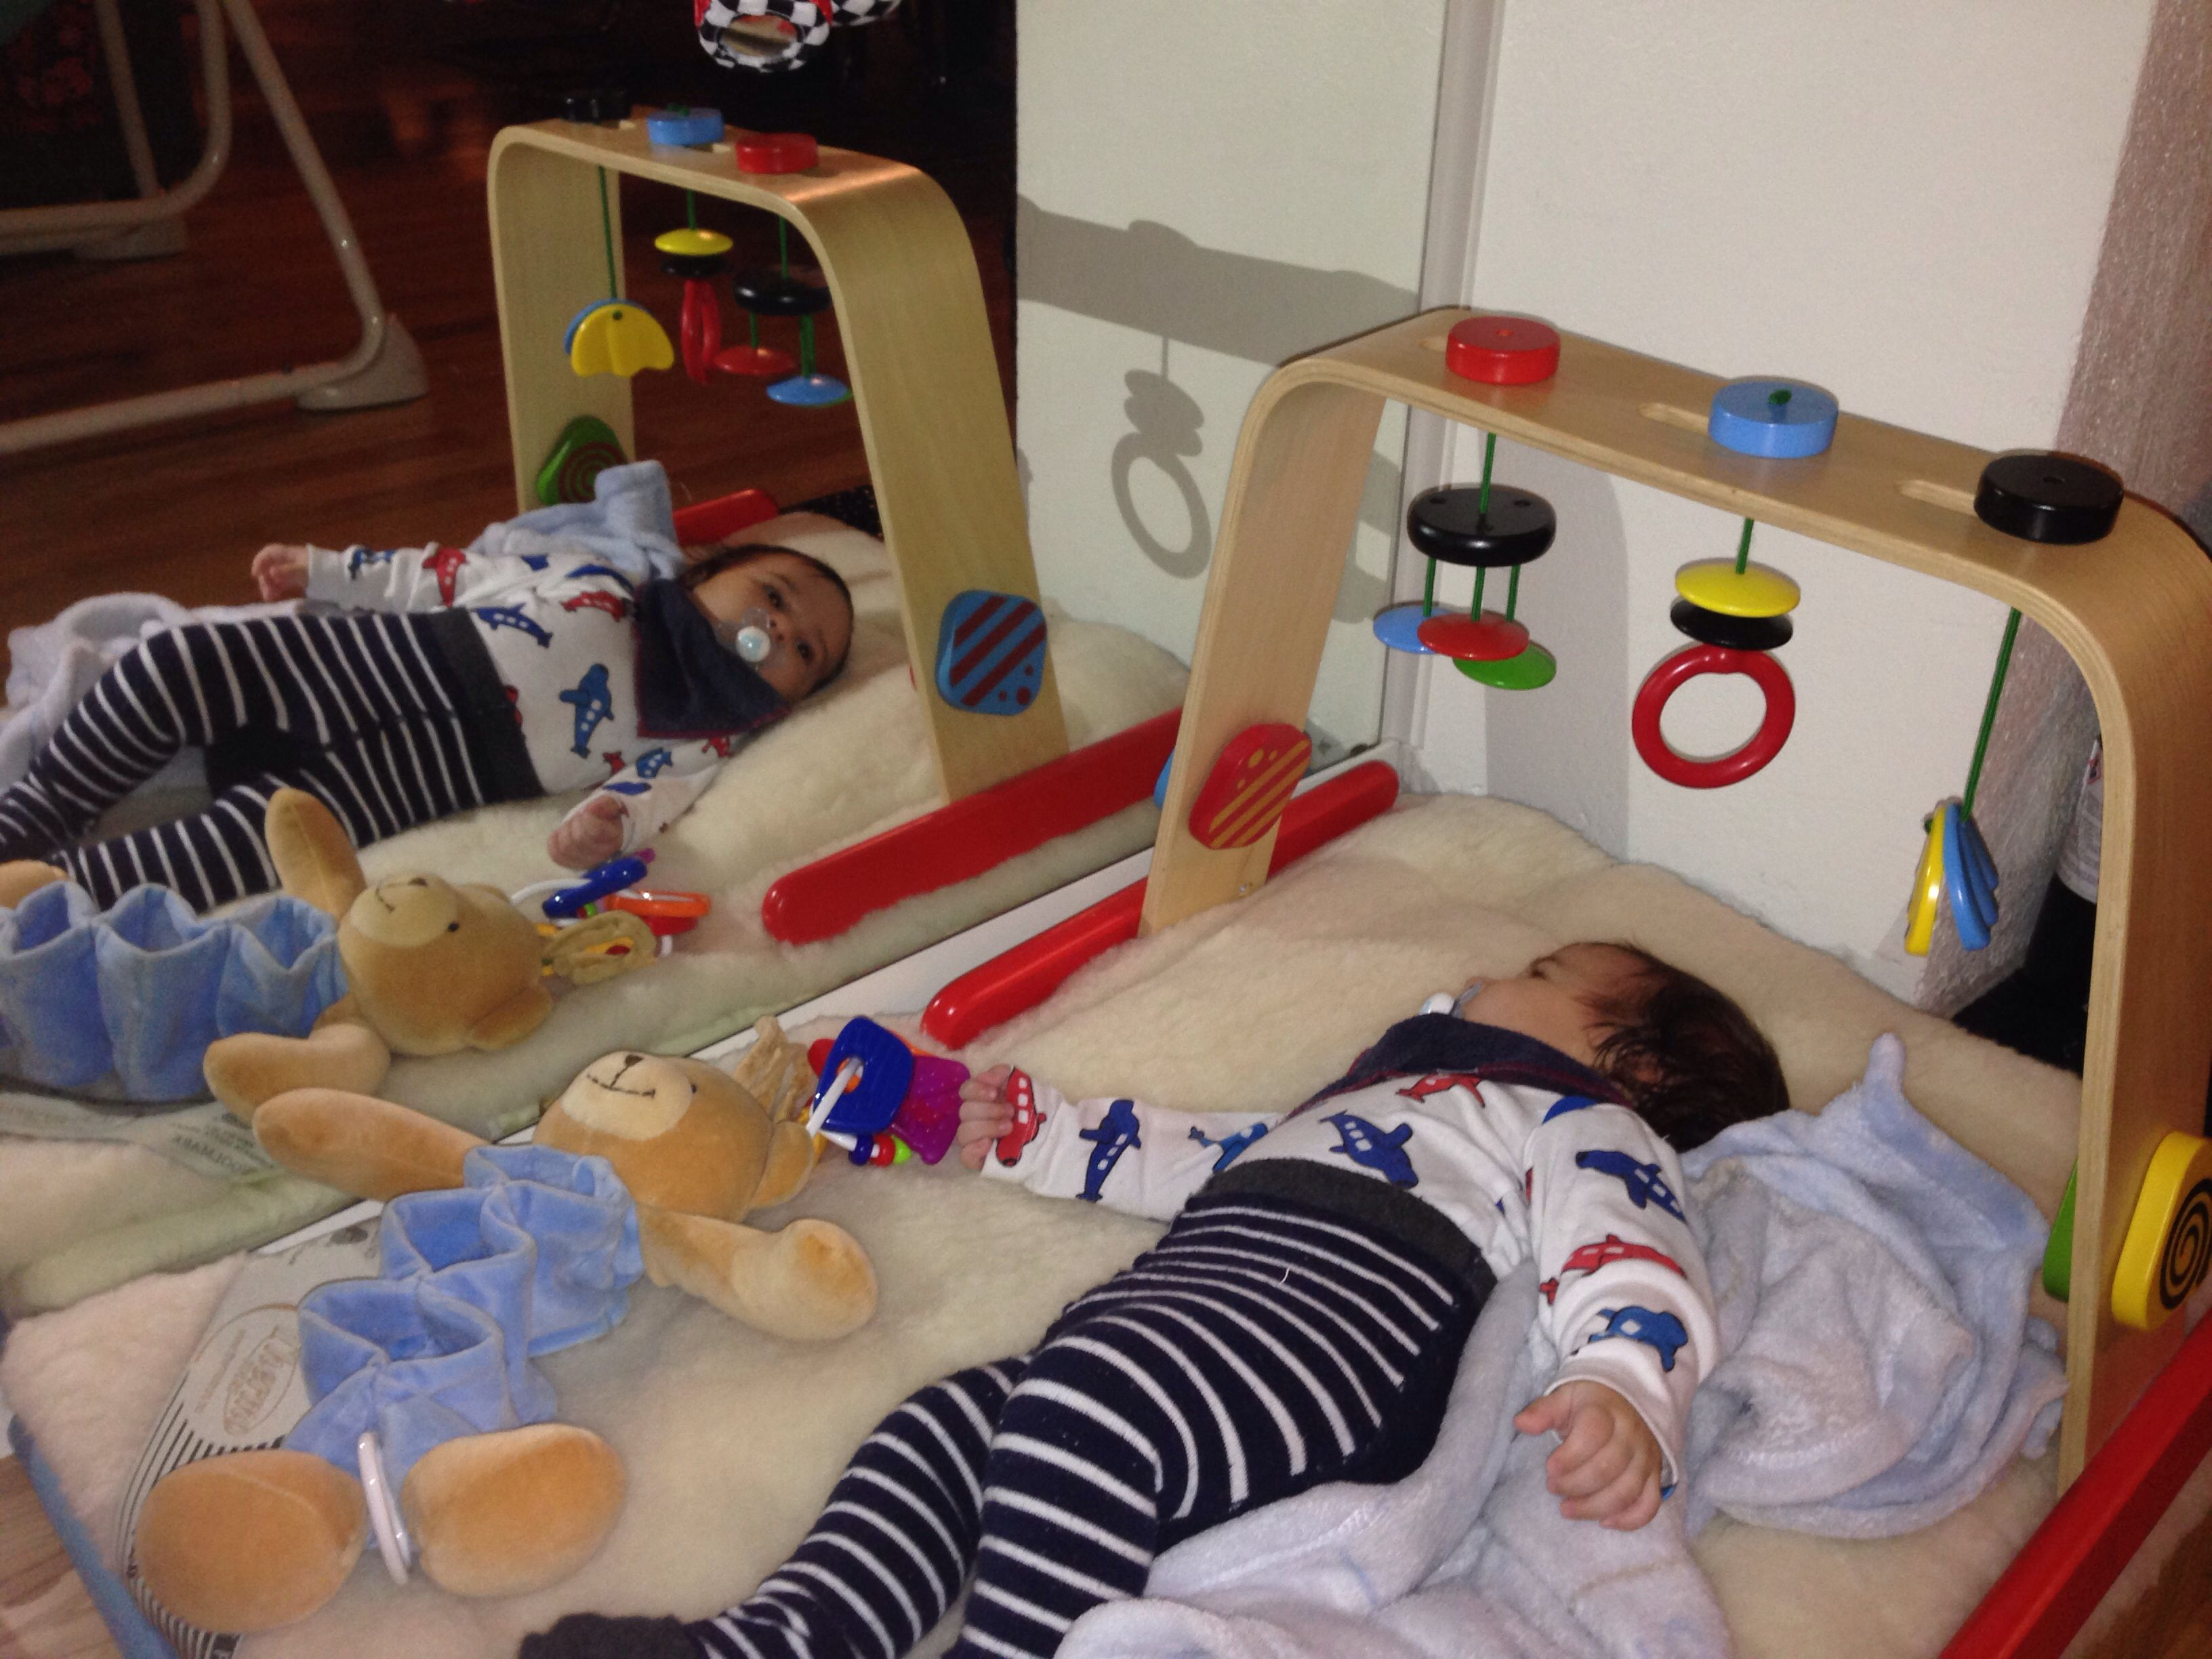 Baby with toys images  Cantinho Montissori da casa  Montessori  Pinterest  Montessori